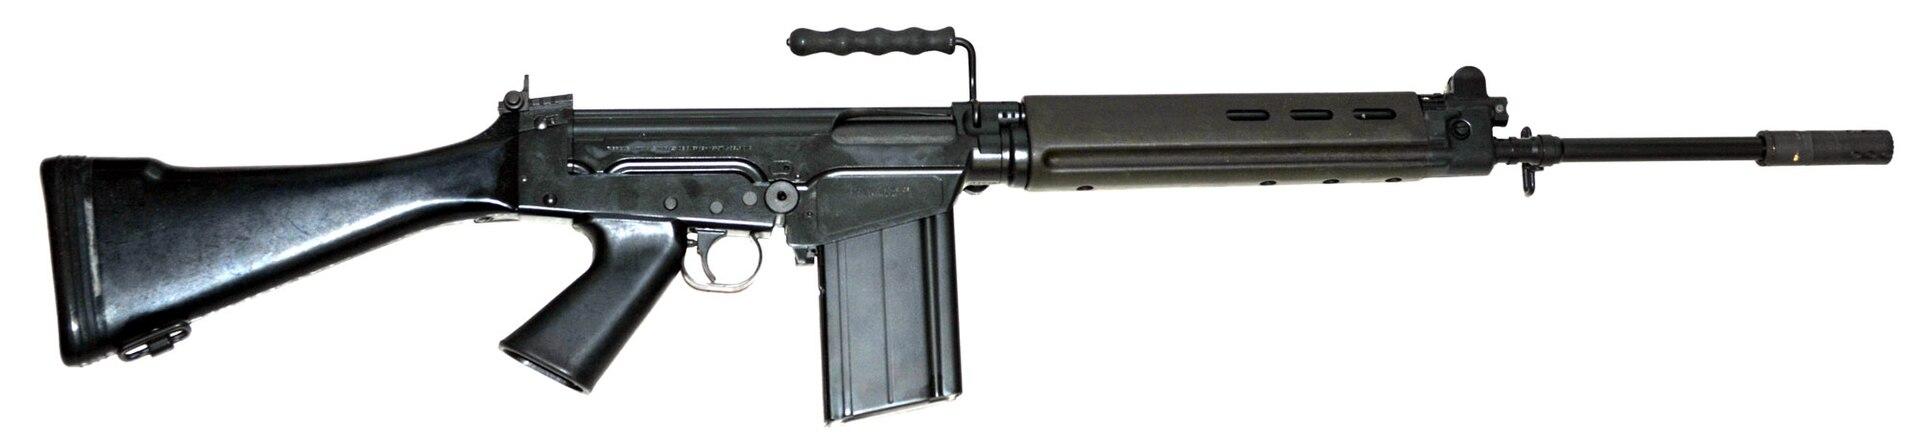 1920px-FN-FAL_belgian.jpeg